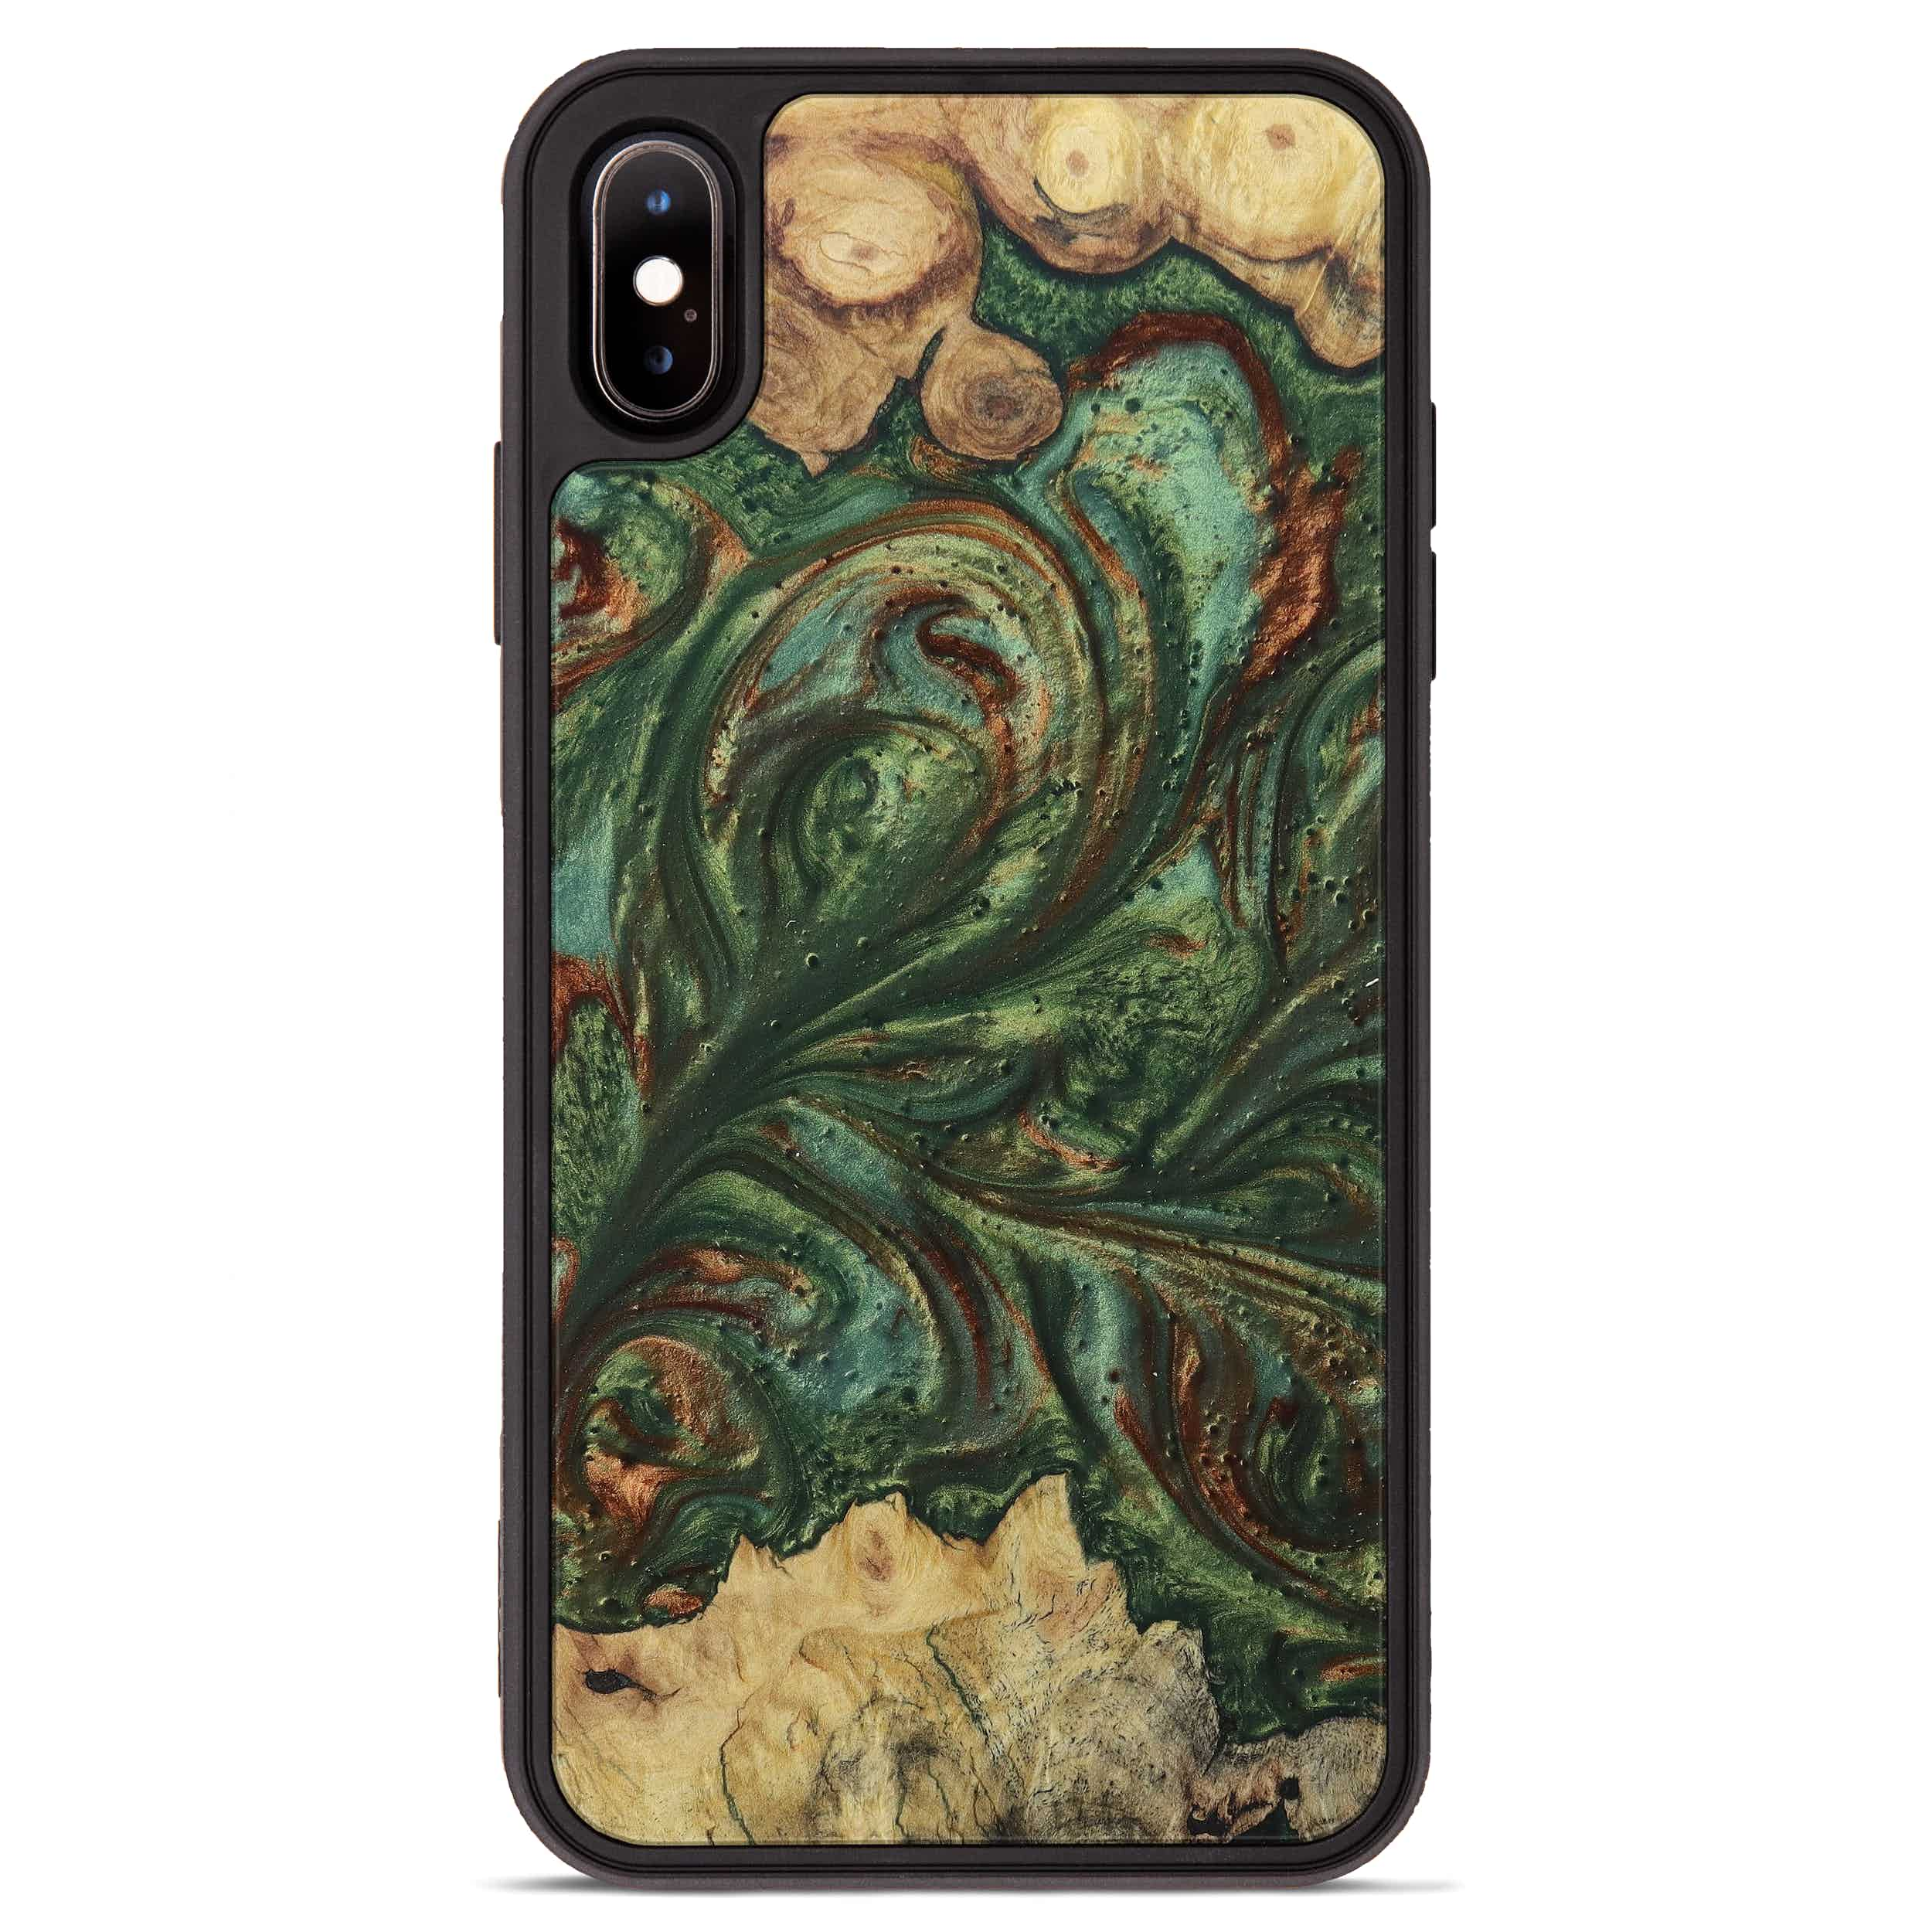 iPhone Xs Max Wood+Resin Phone Case - Melek (Dark Green, 395224)